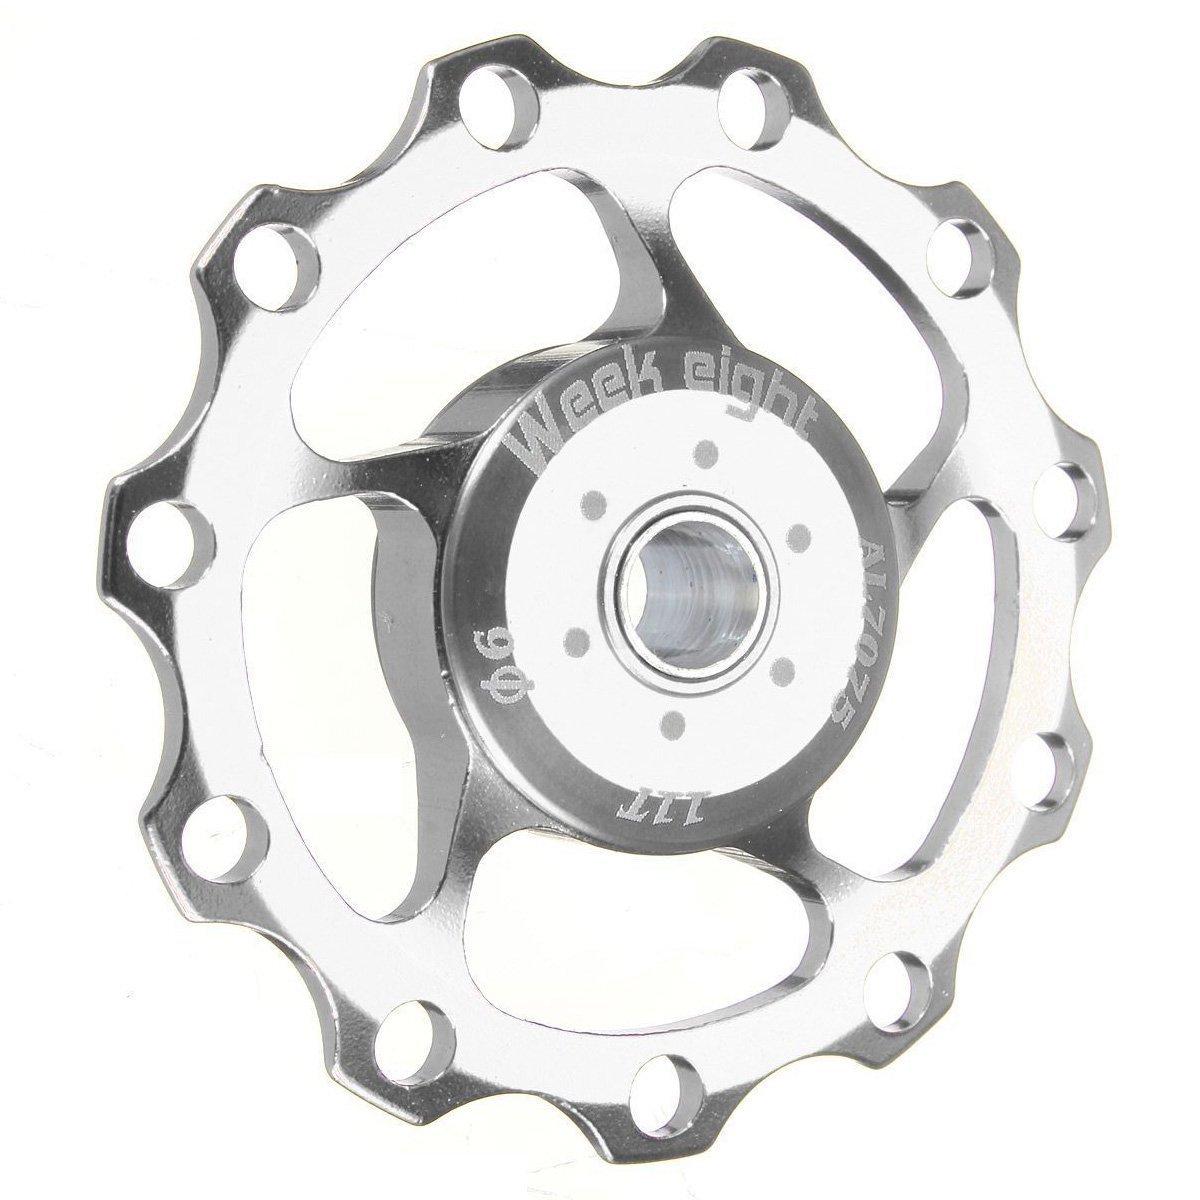 week eight polea de cambio trasero de rueda de guia de 11 dientes de bicicleta de montana de aluminio para jinete para SHIMANO SRAM plata Rueda de guia de bicicleta